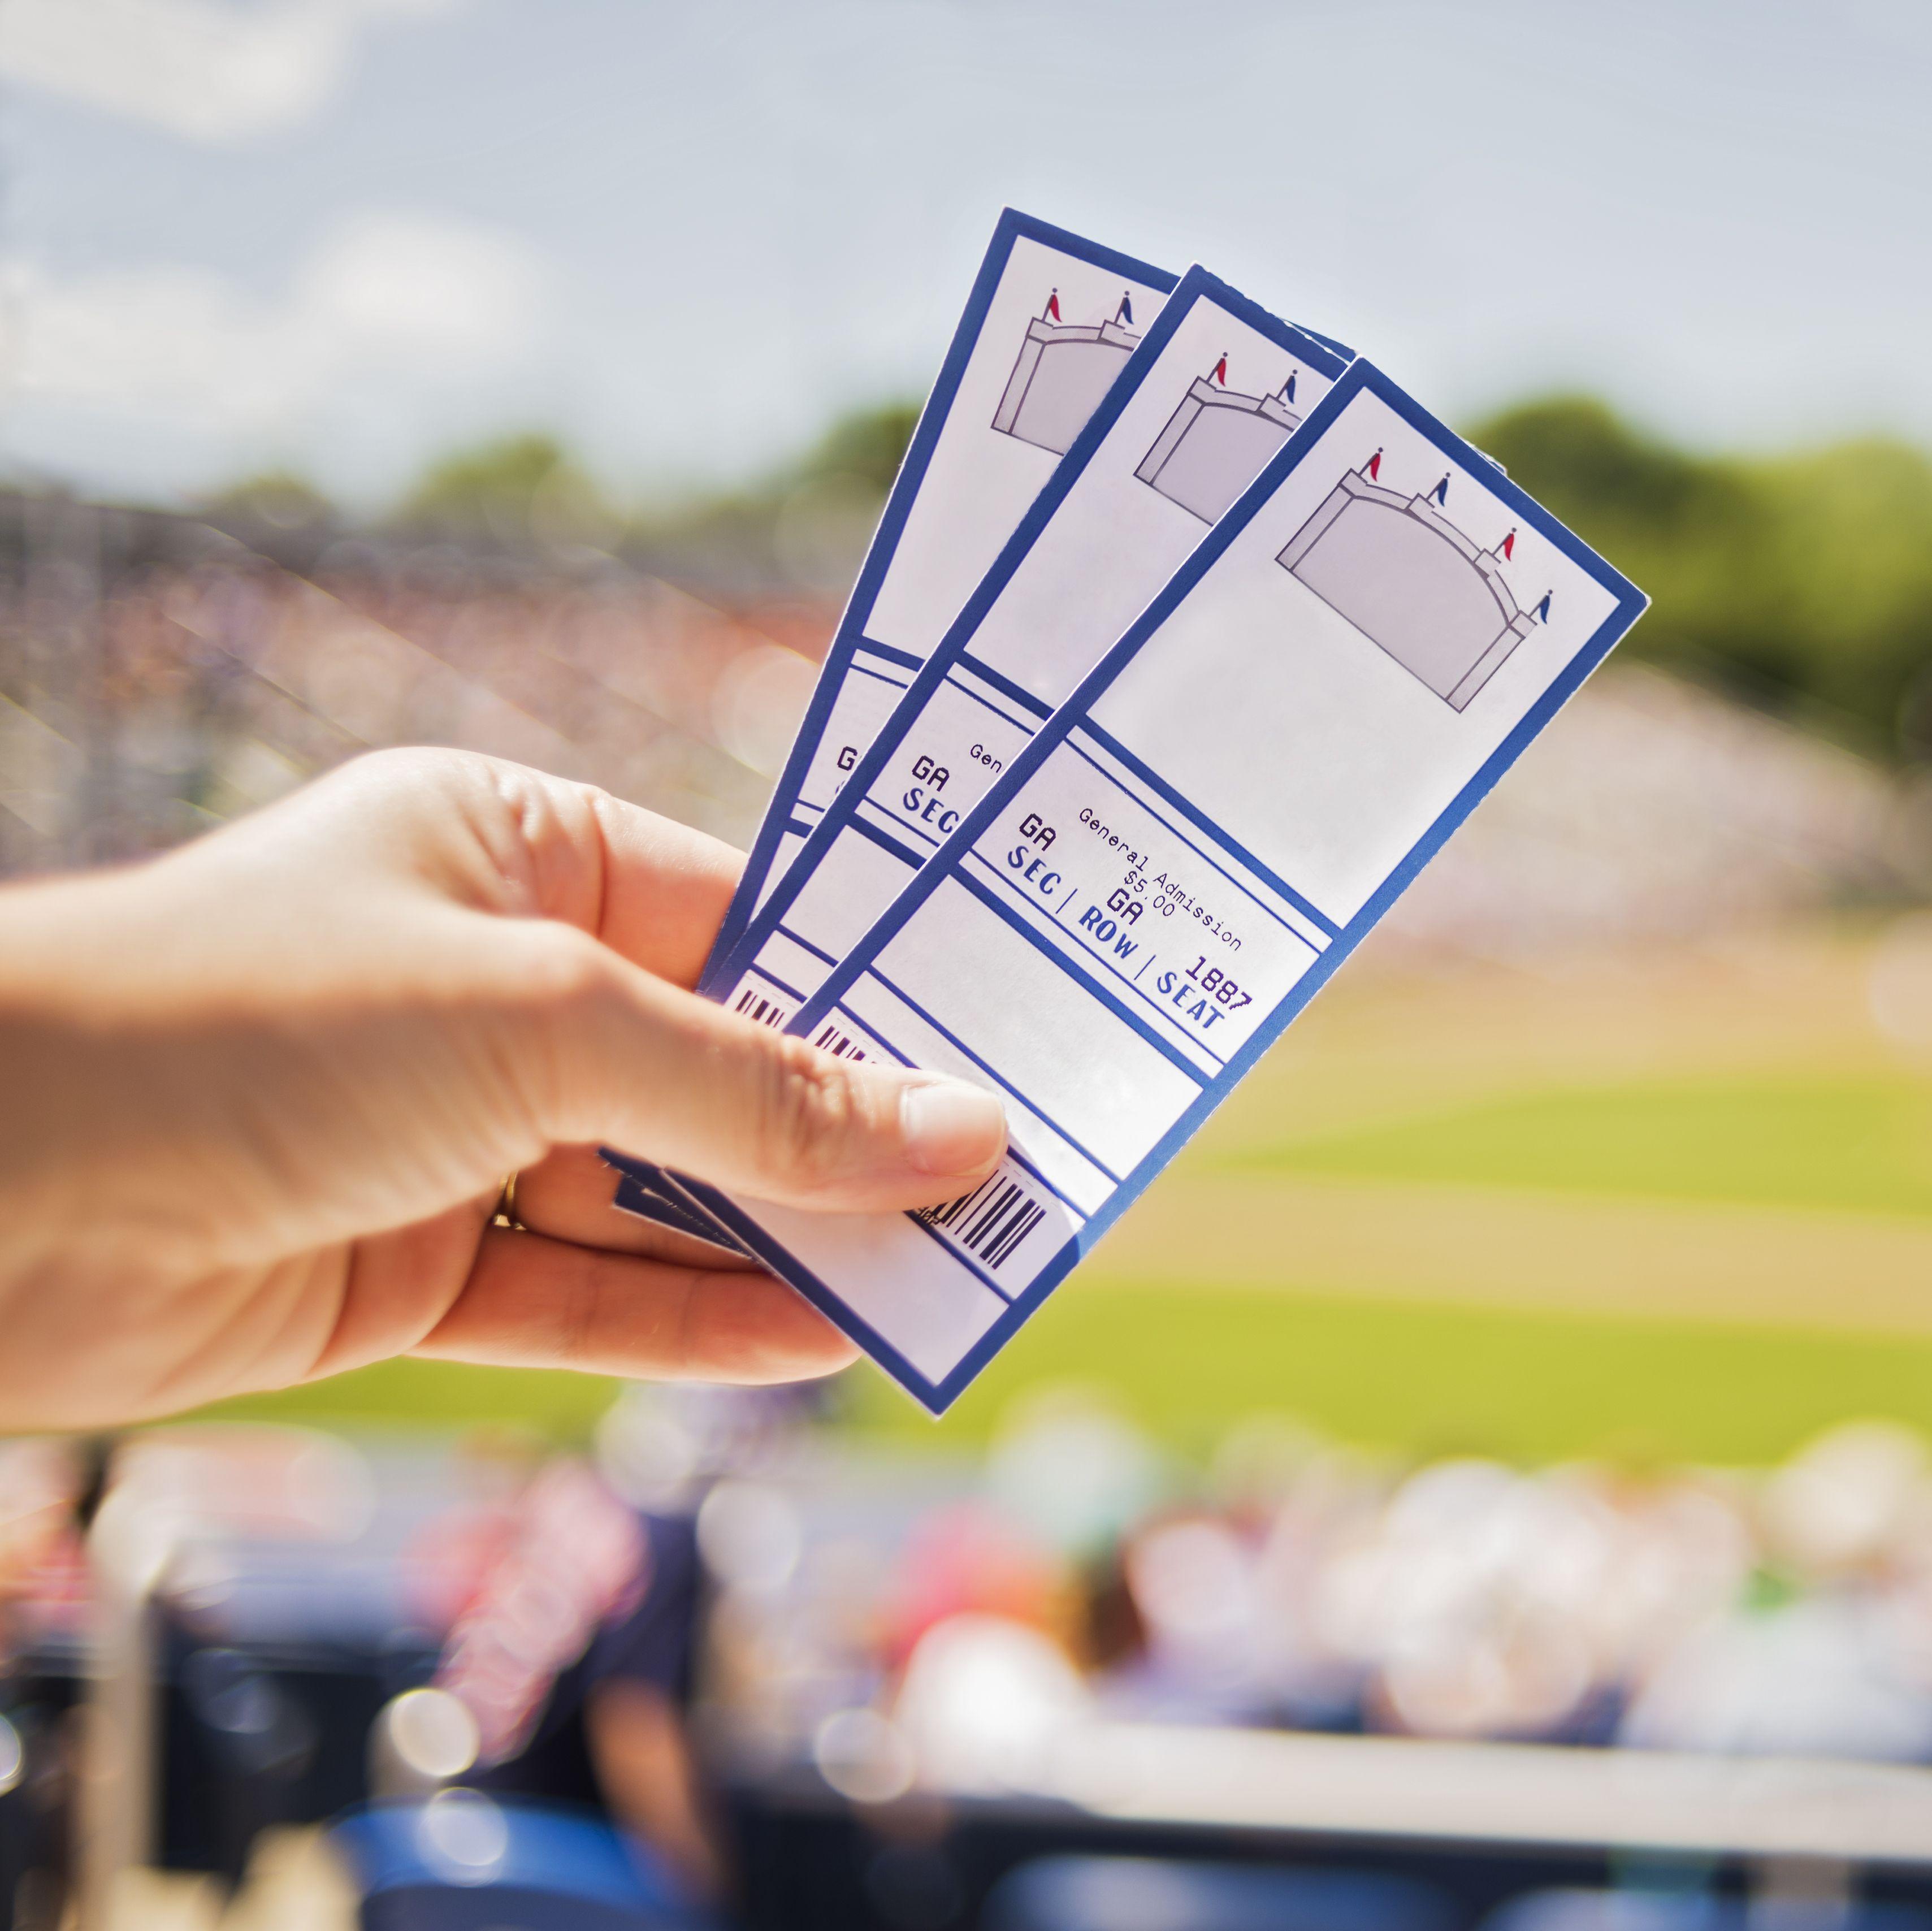 USA, Maine, Portland, Close-up of hand holding tickets at stadium